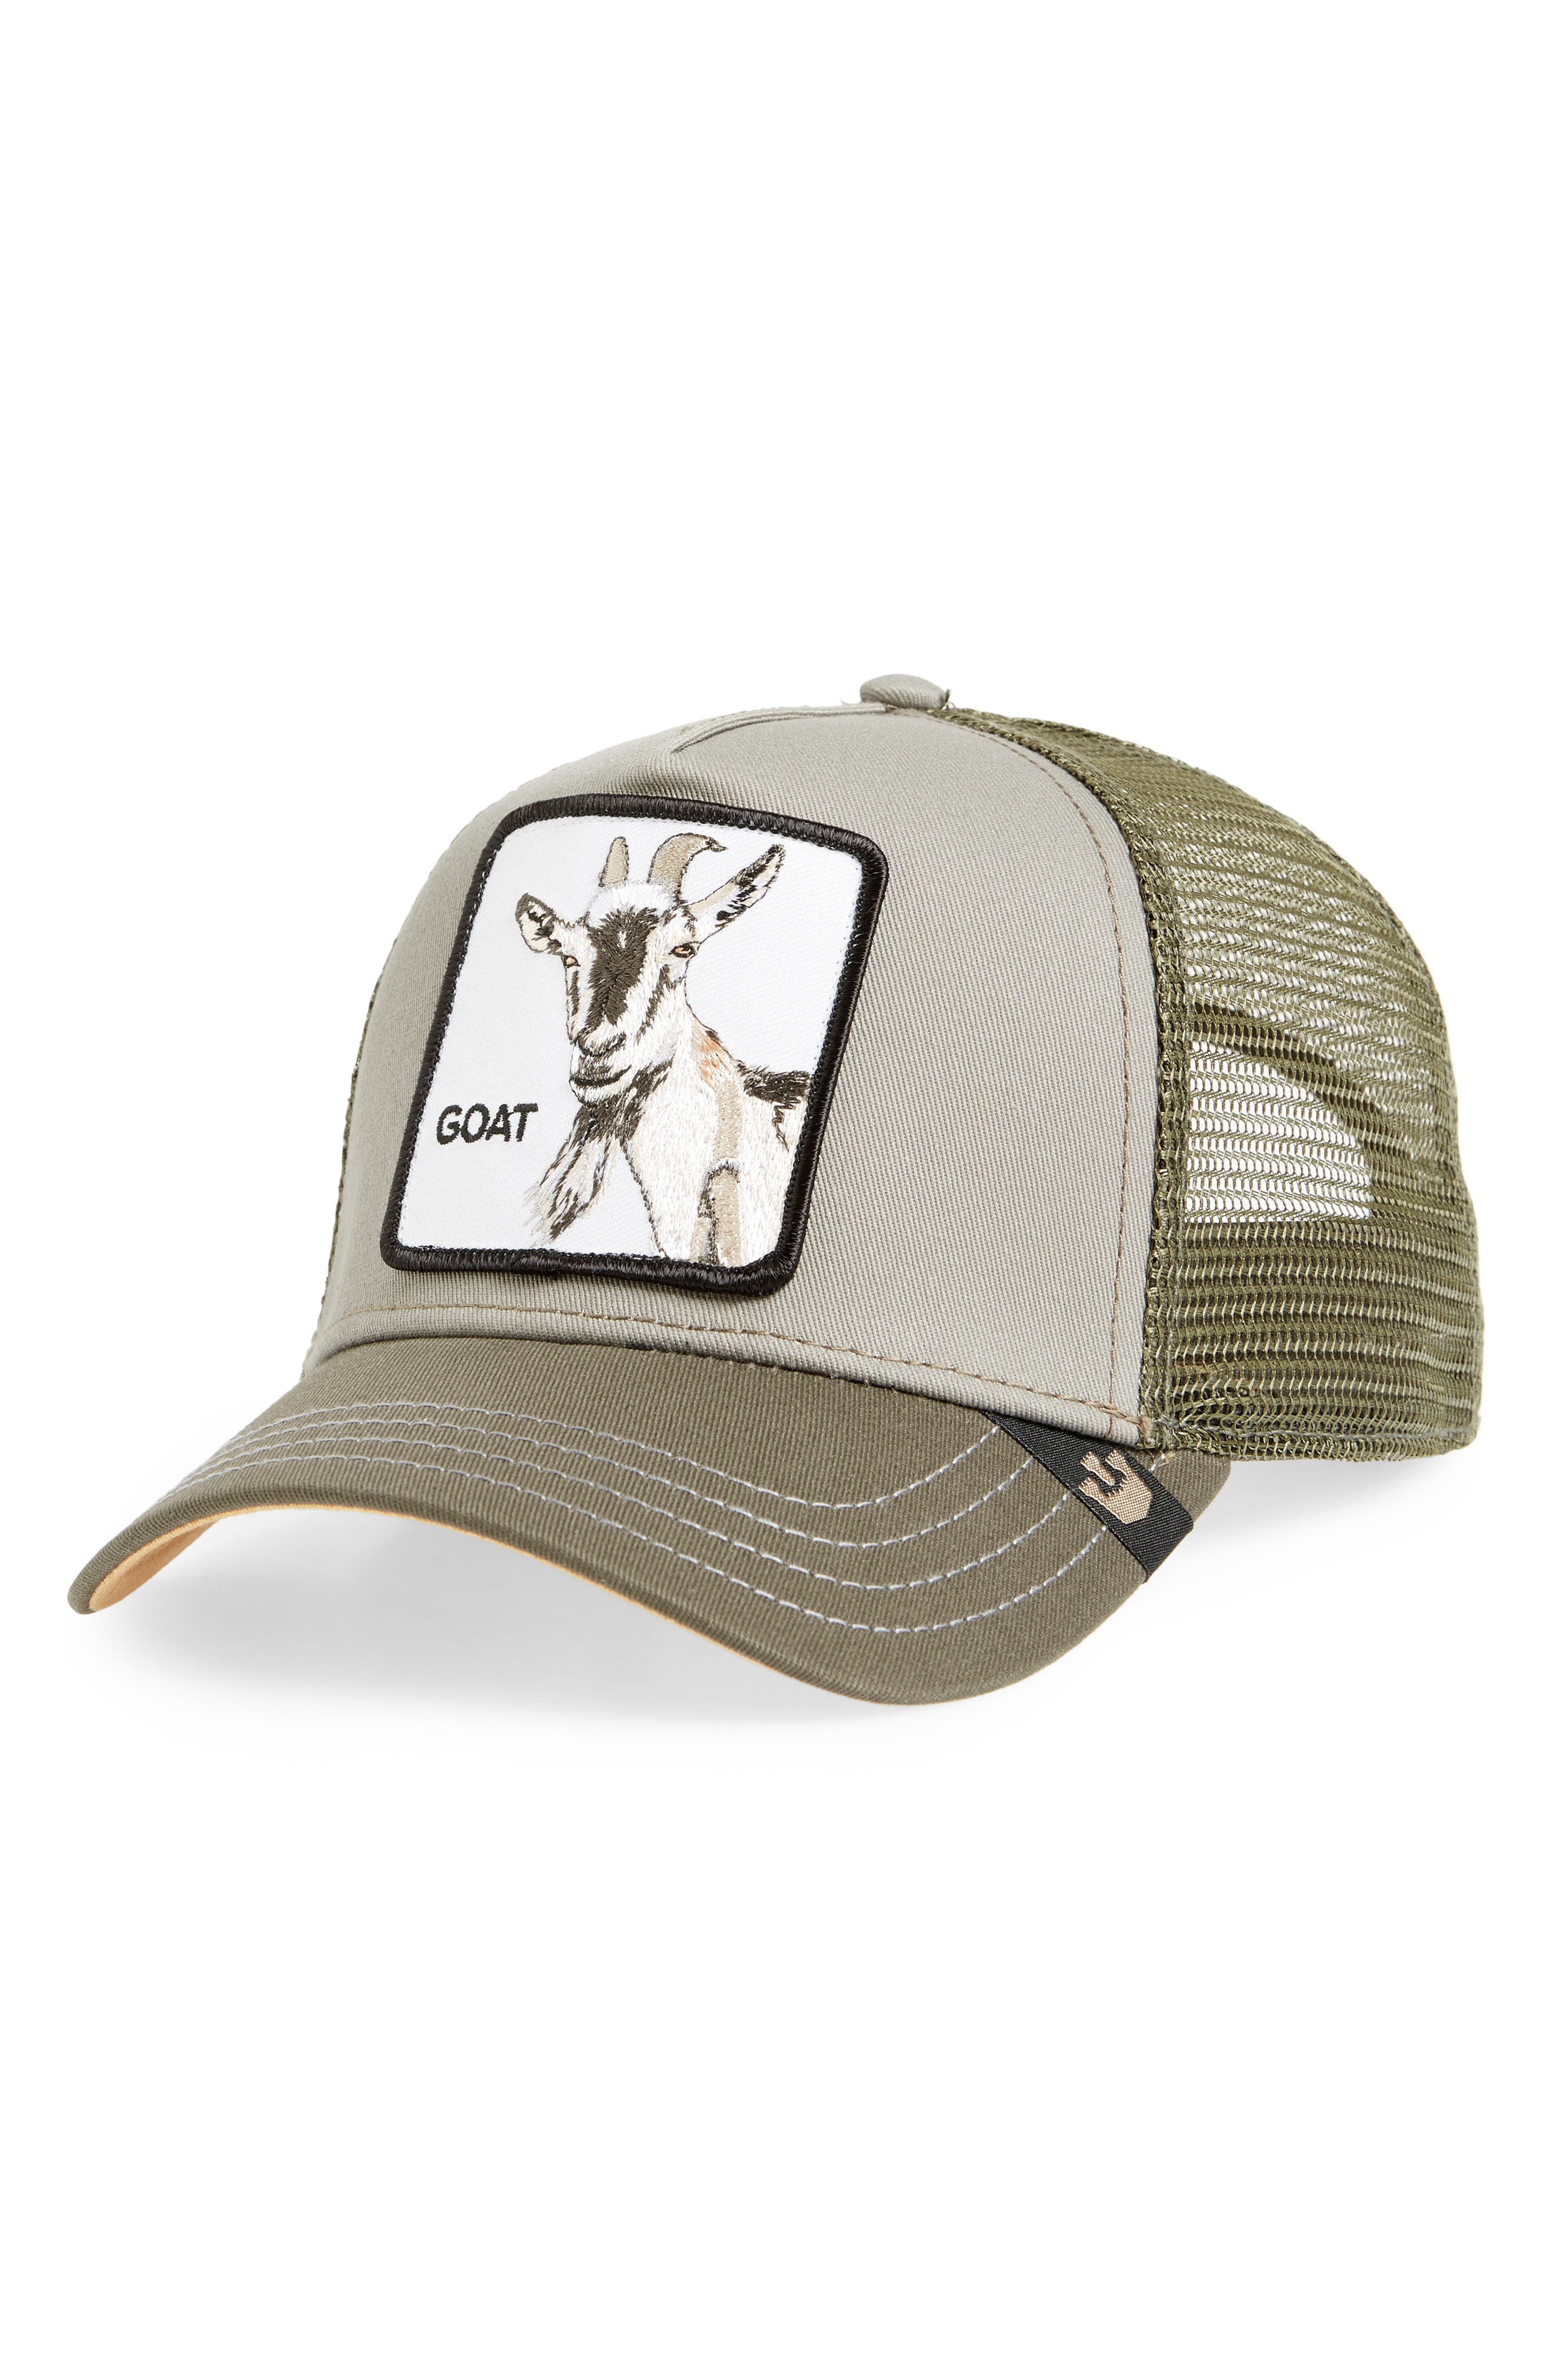 Goat Beard Trucker Hat,                             Main thumbnail 1, color,                             OLIVE